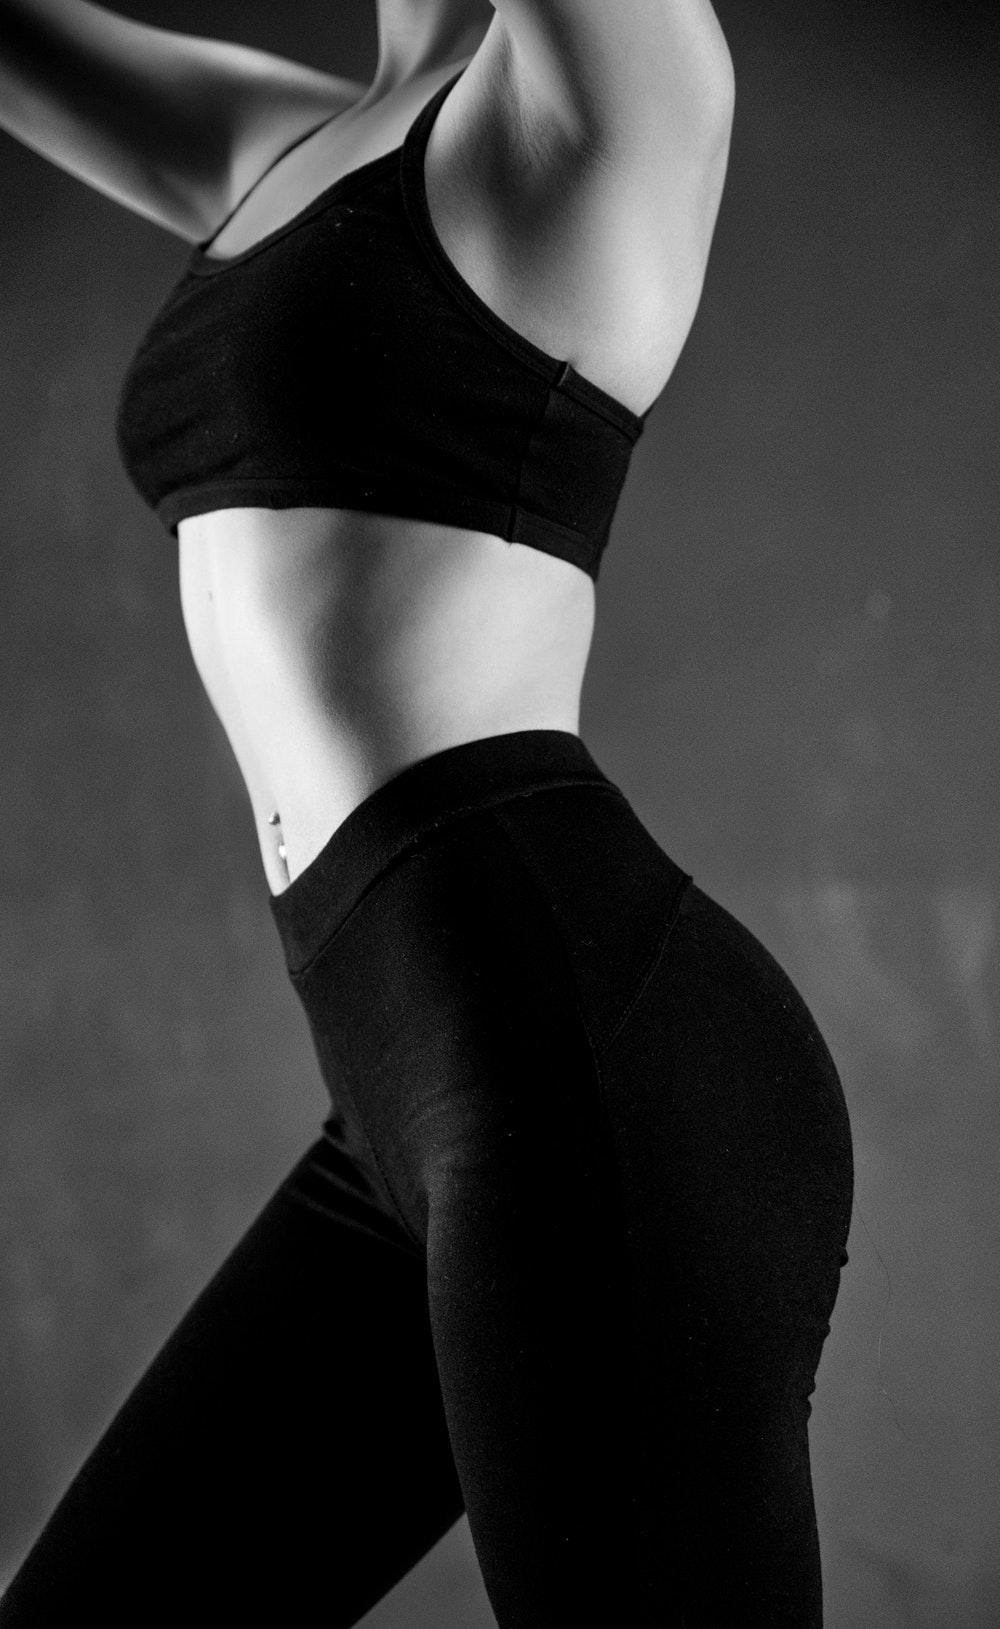 Flat Belly.jpg